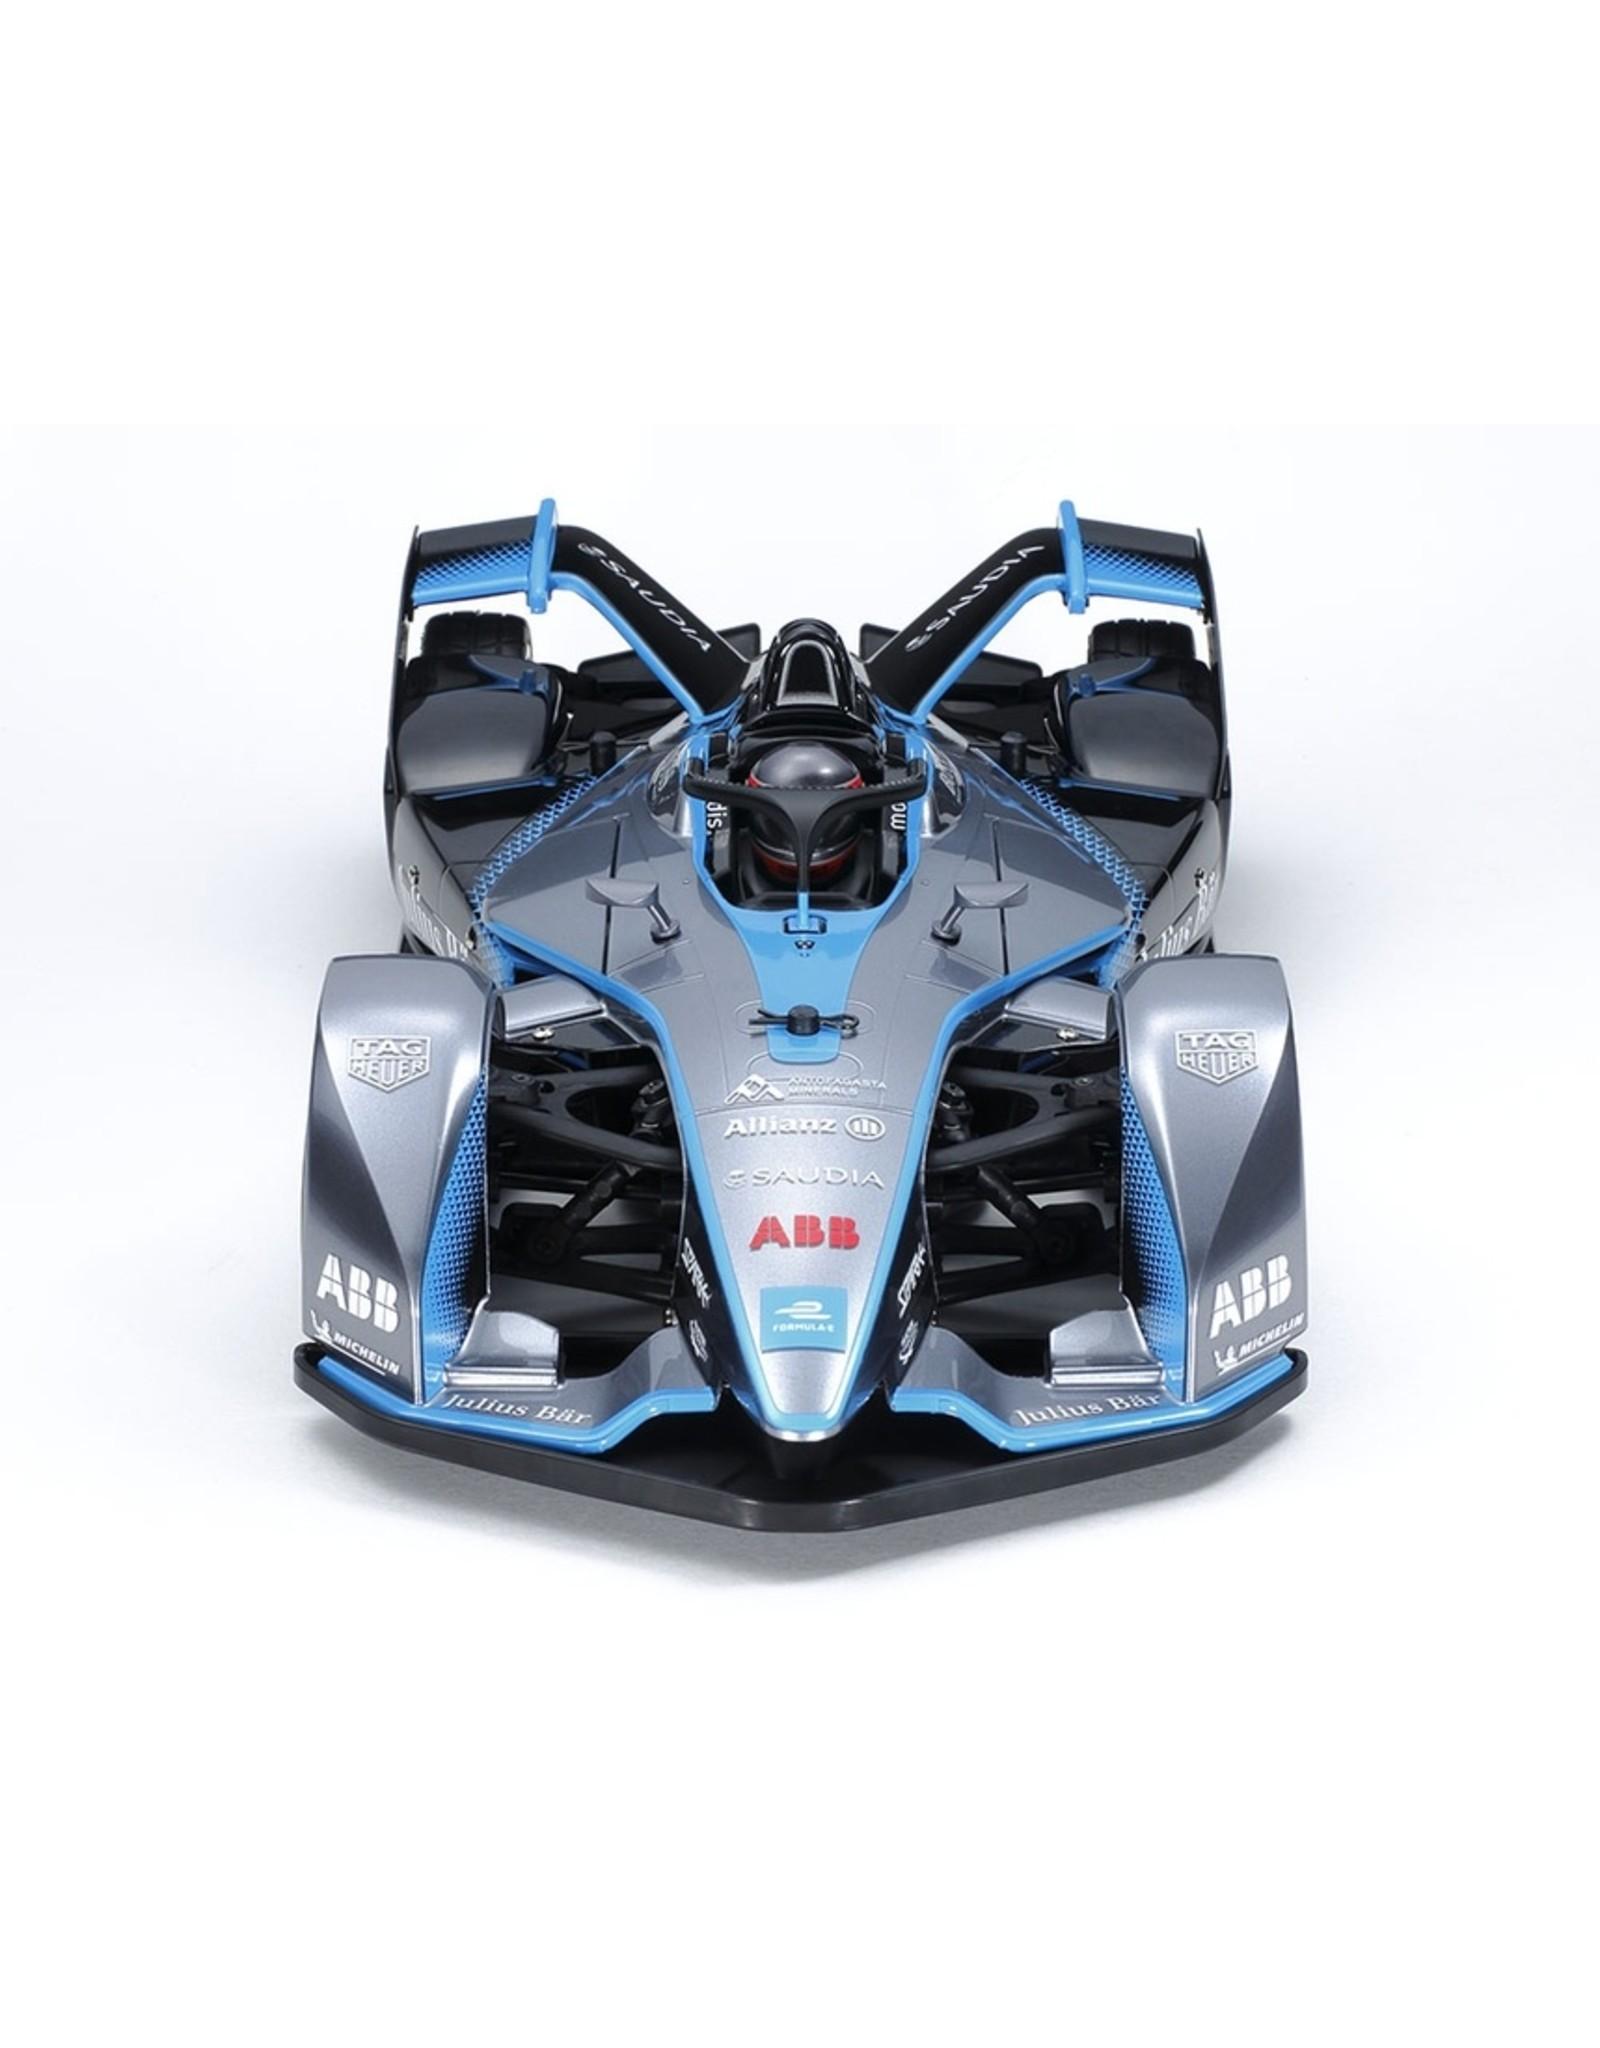 Tamiya 1/10 Formula E Gen2 Car - TC-01 Chassis Kit